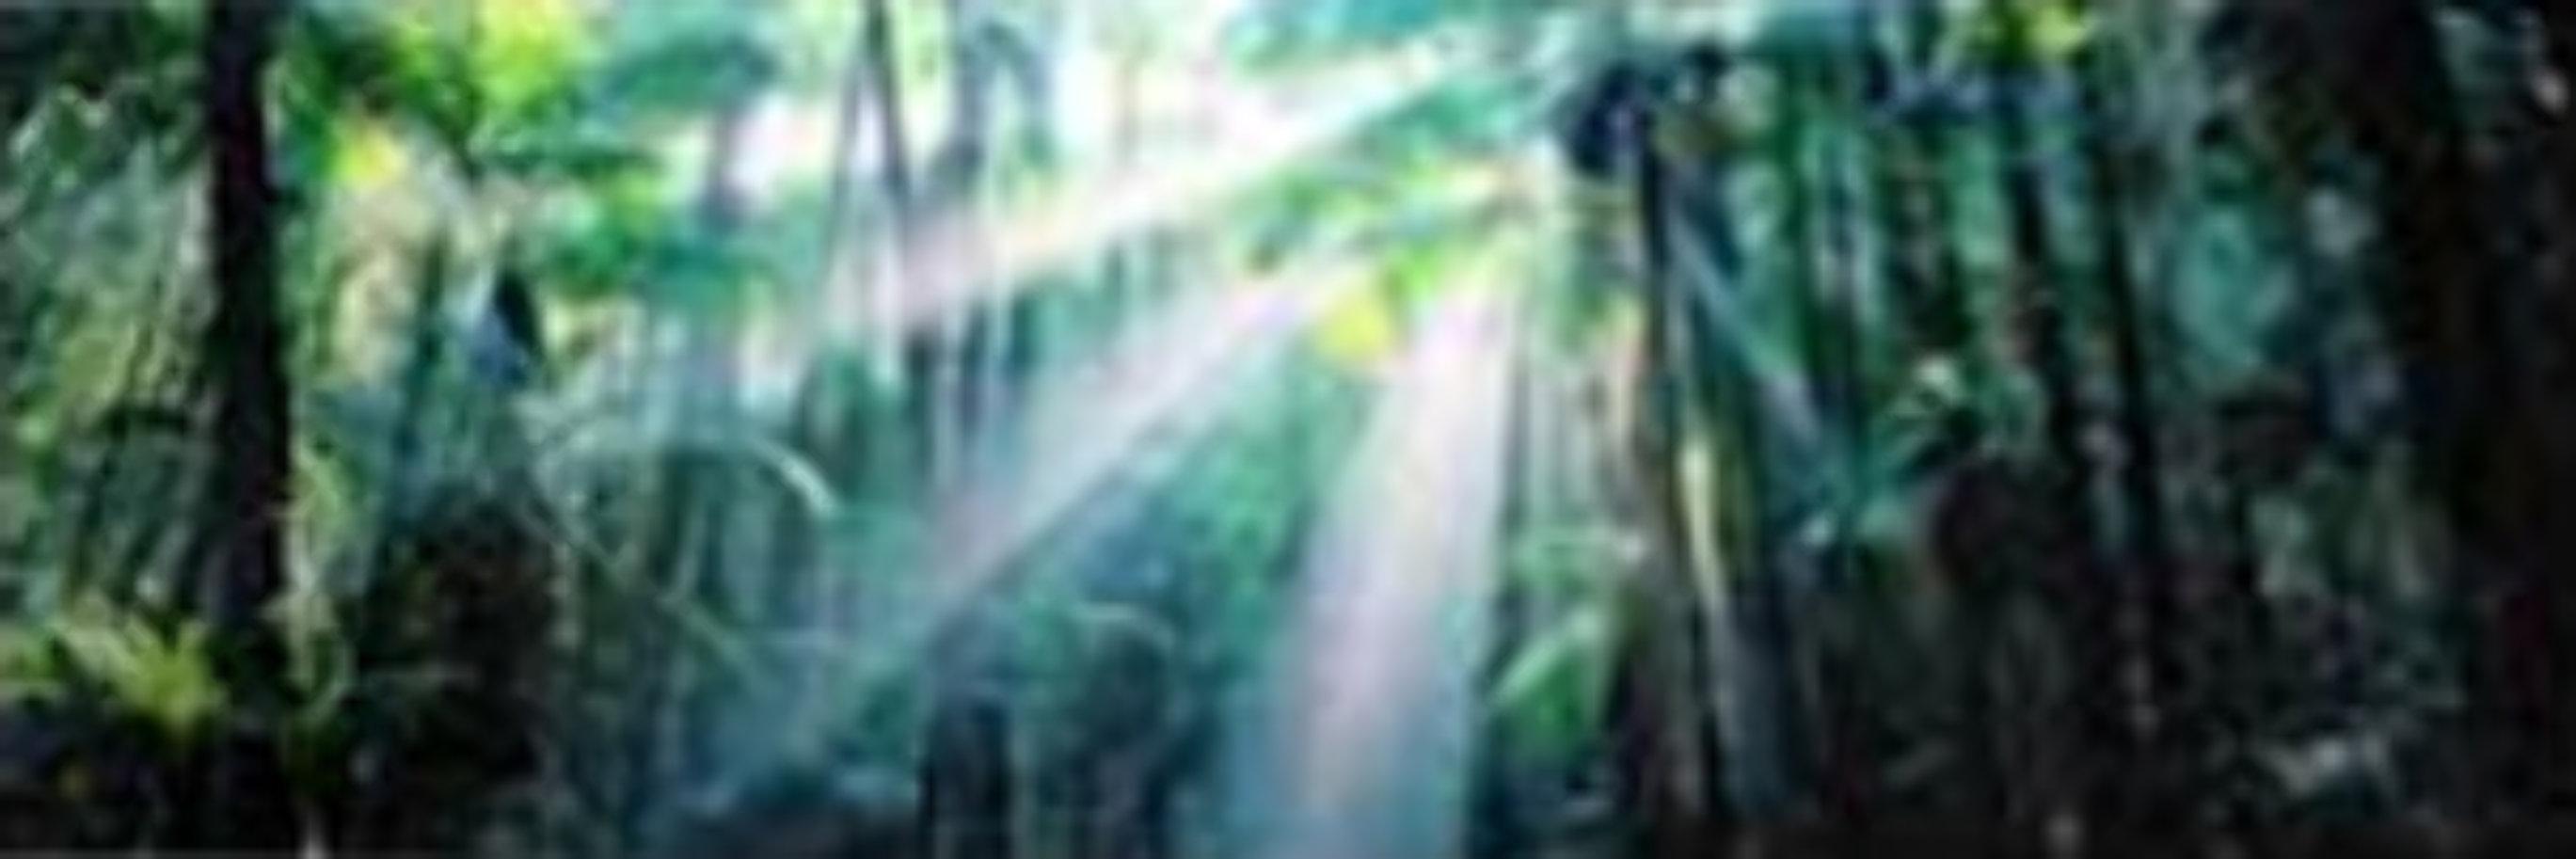 Enchanted Forest (Fraser Island, Queensland) Australia 2M Super Huge Panorama by Peter Lik